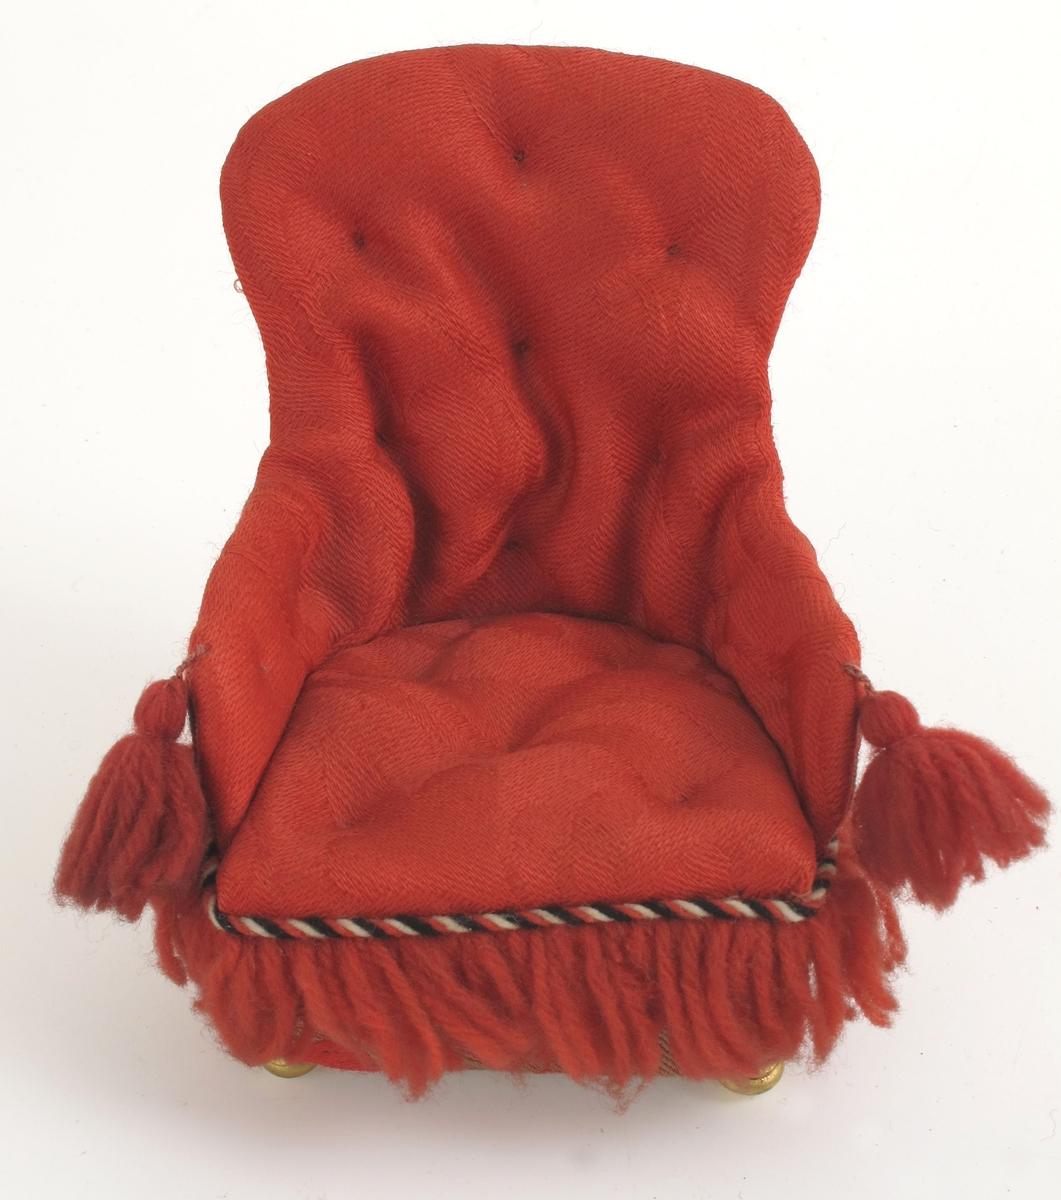 Rød ulldamask, med frynser og pomponger.  Baksiden gråmønstret rødt